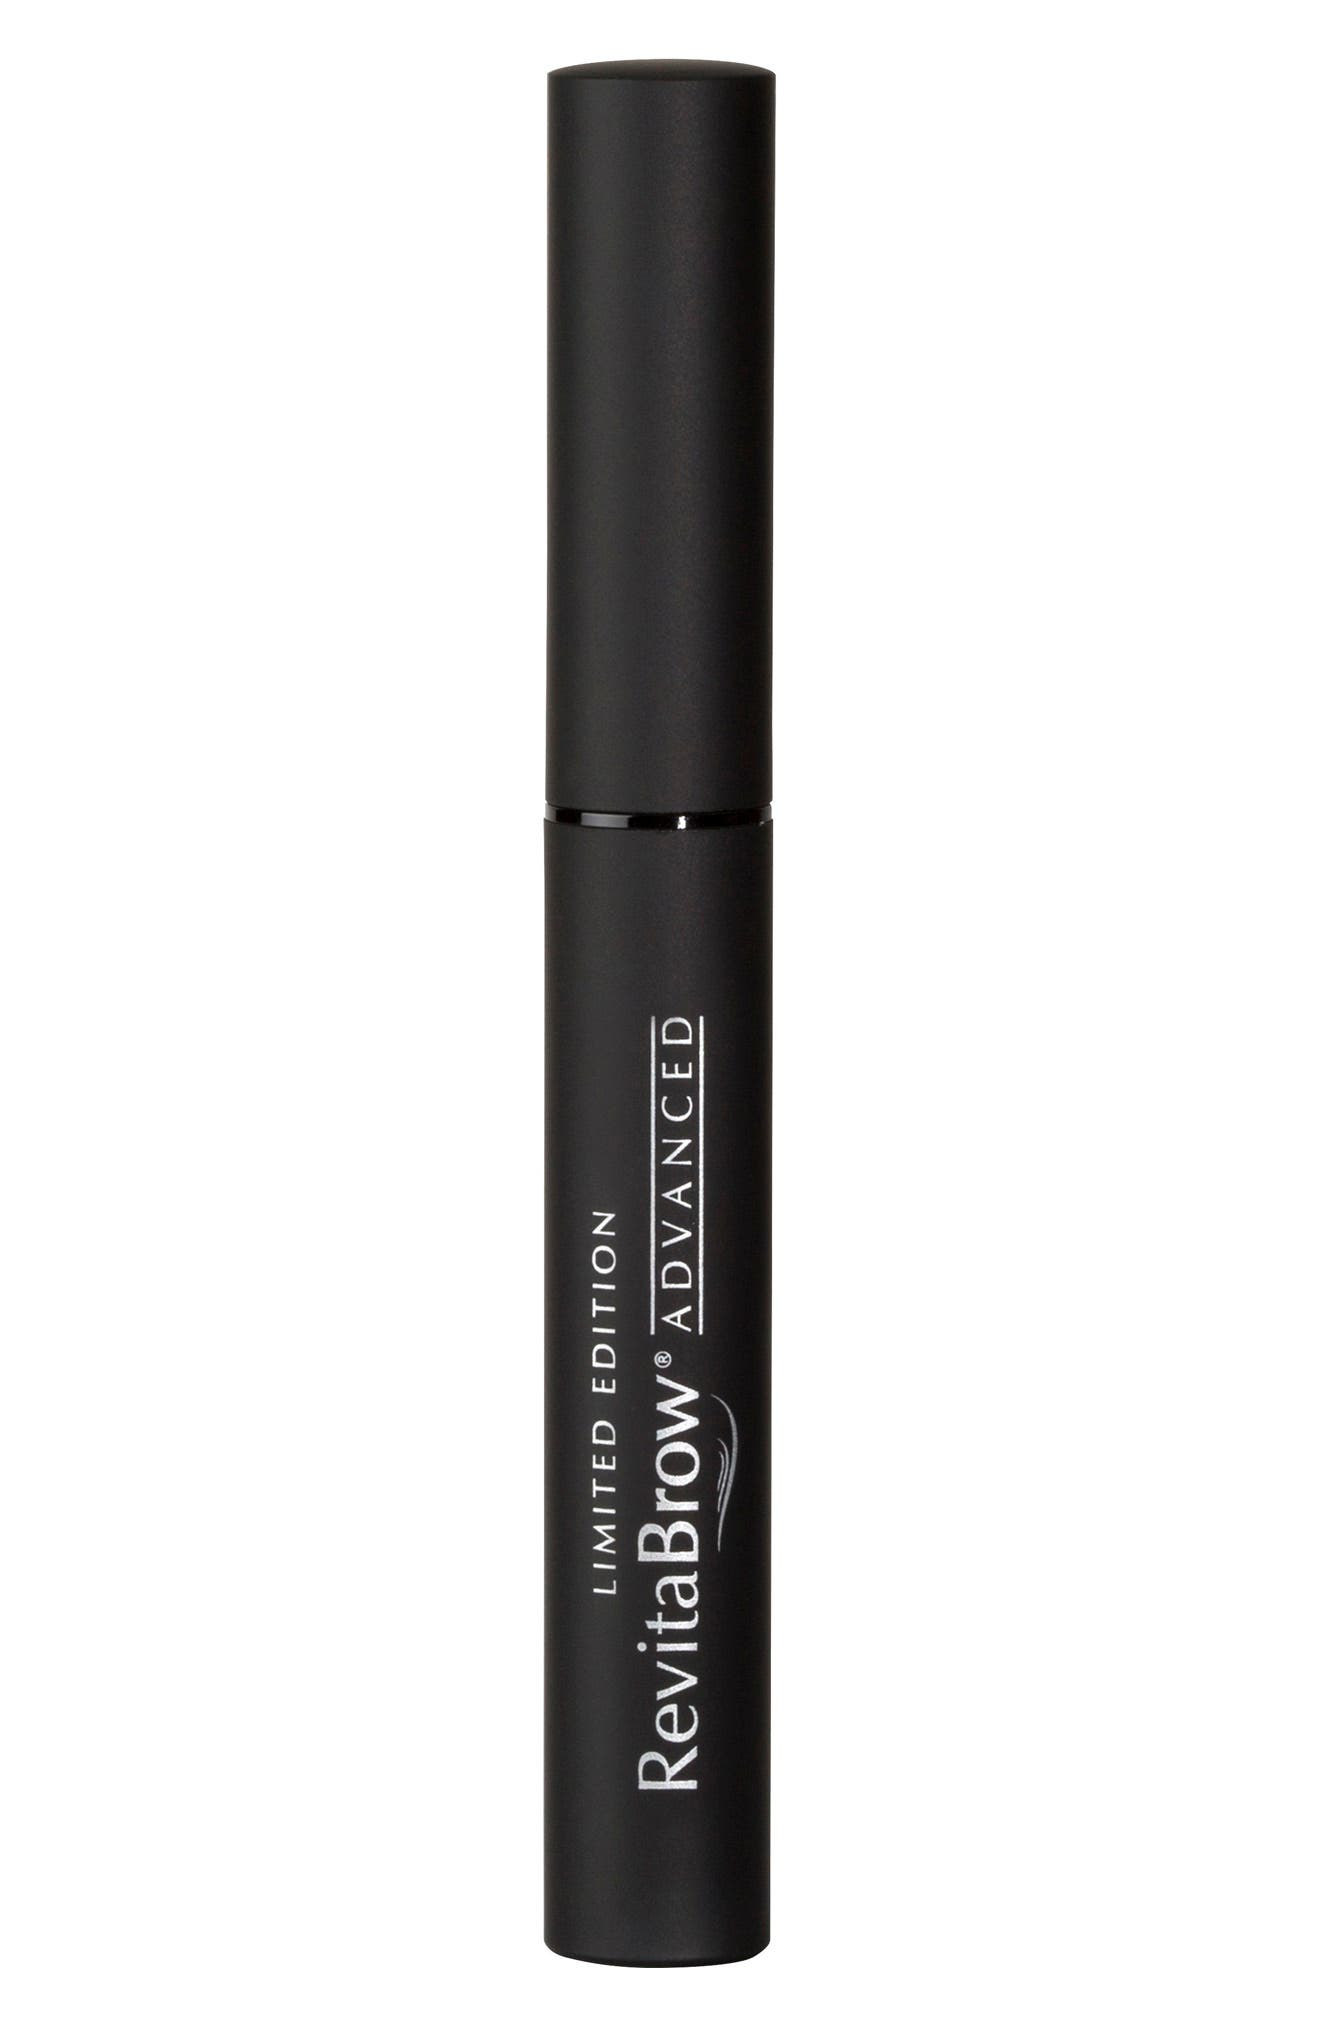 RevitaBrow<sup>®</sup> ADVANCED Eyebrow Conditioner,                             Main thumbnail 1, color,                             No Color